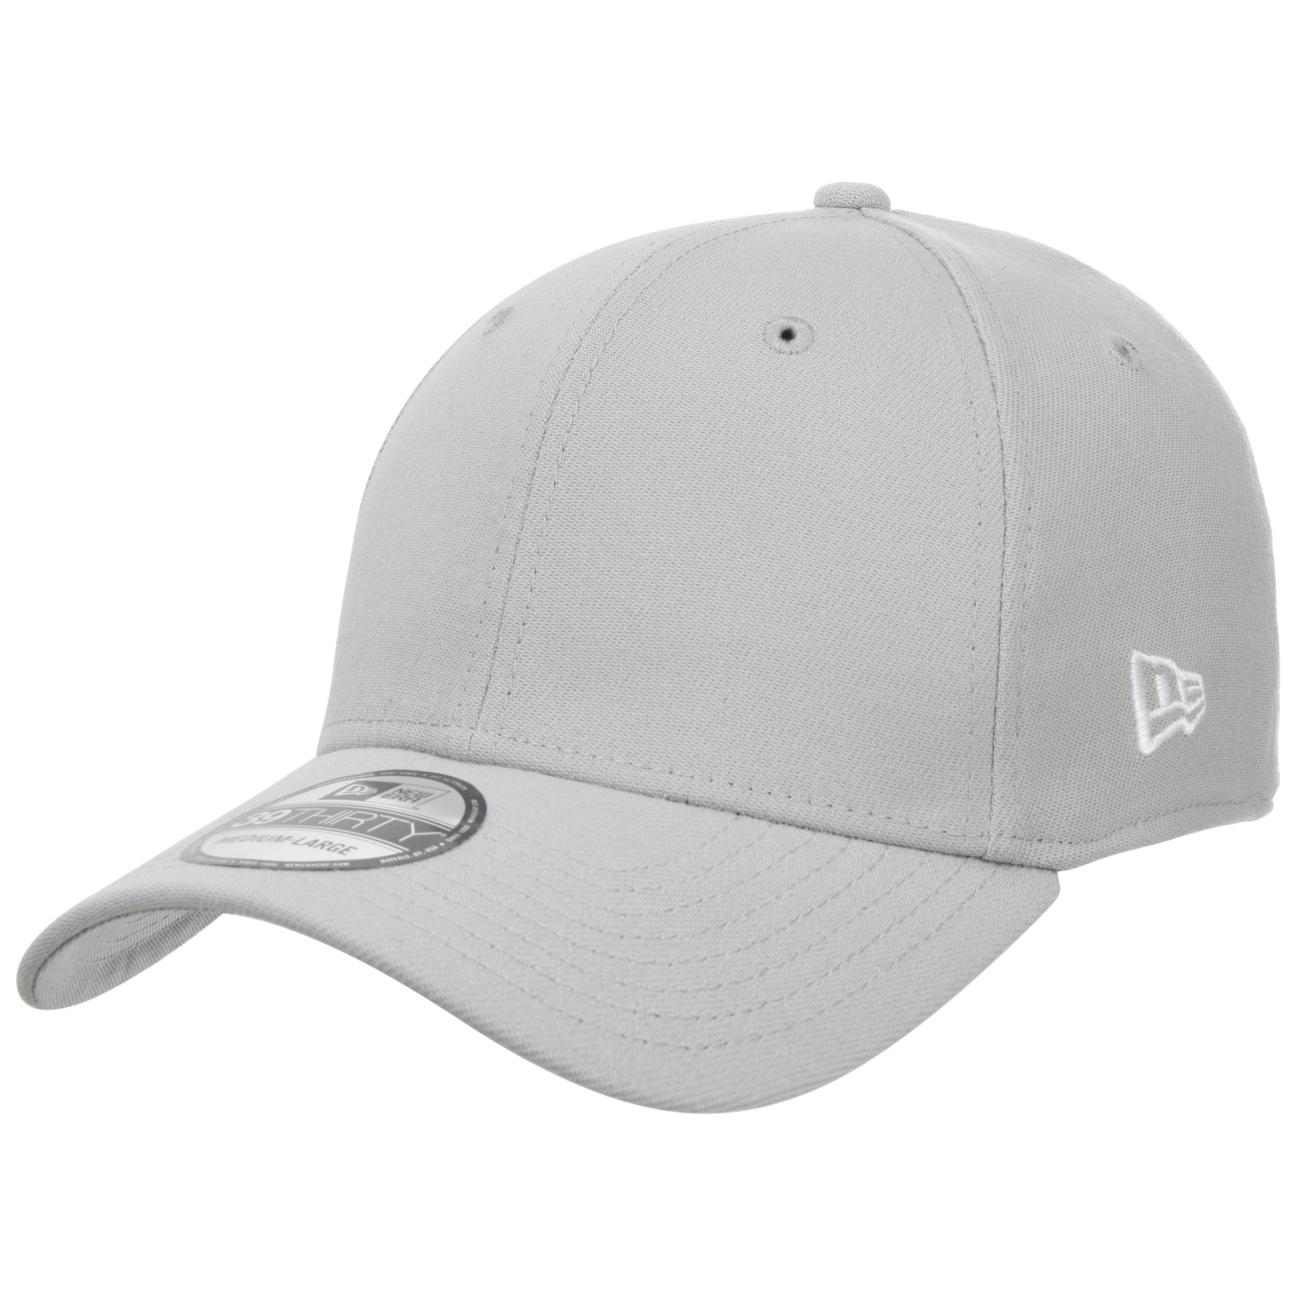 39Thirty Blank Baseball Cap by New Era